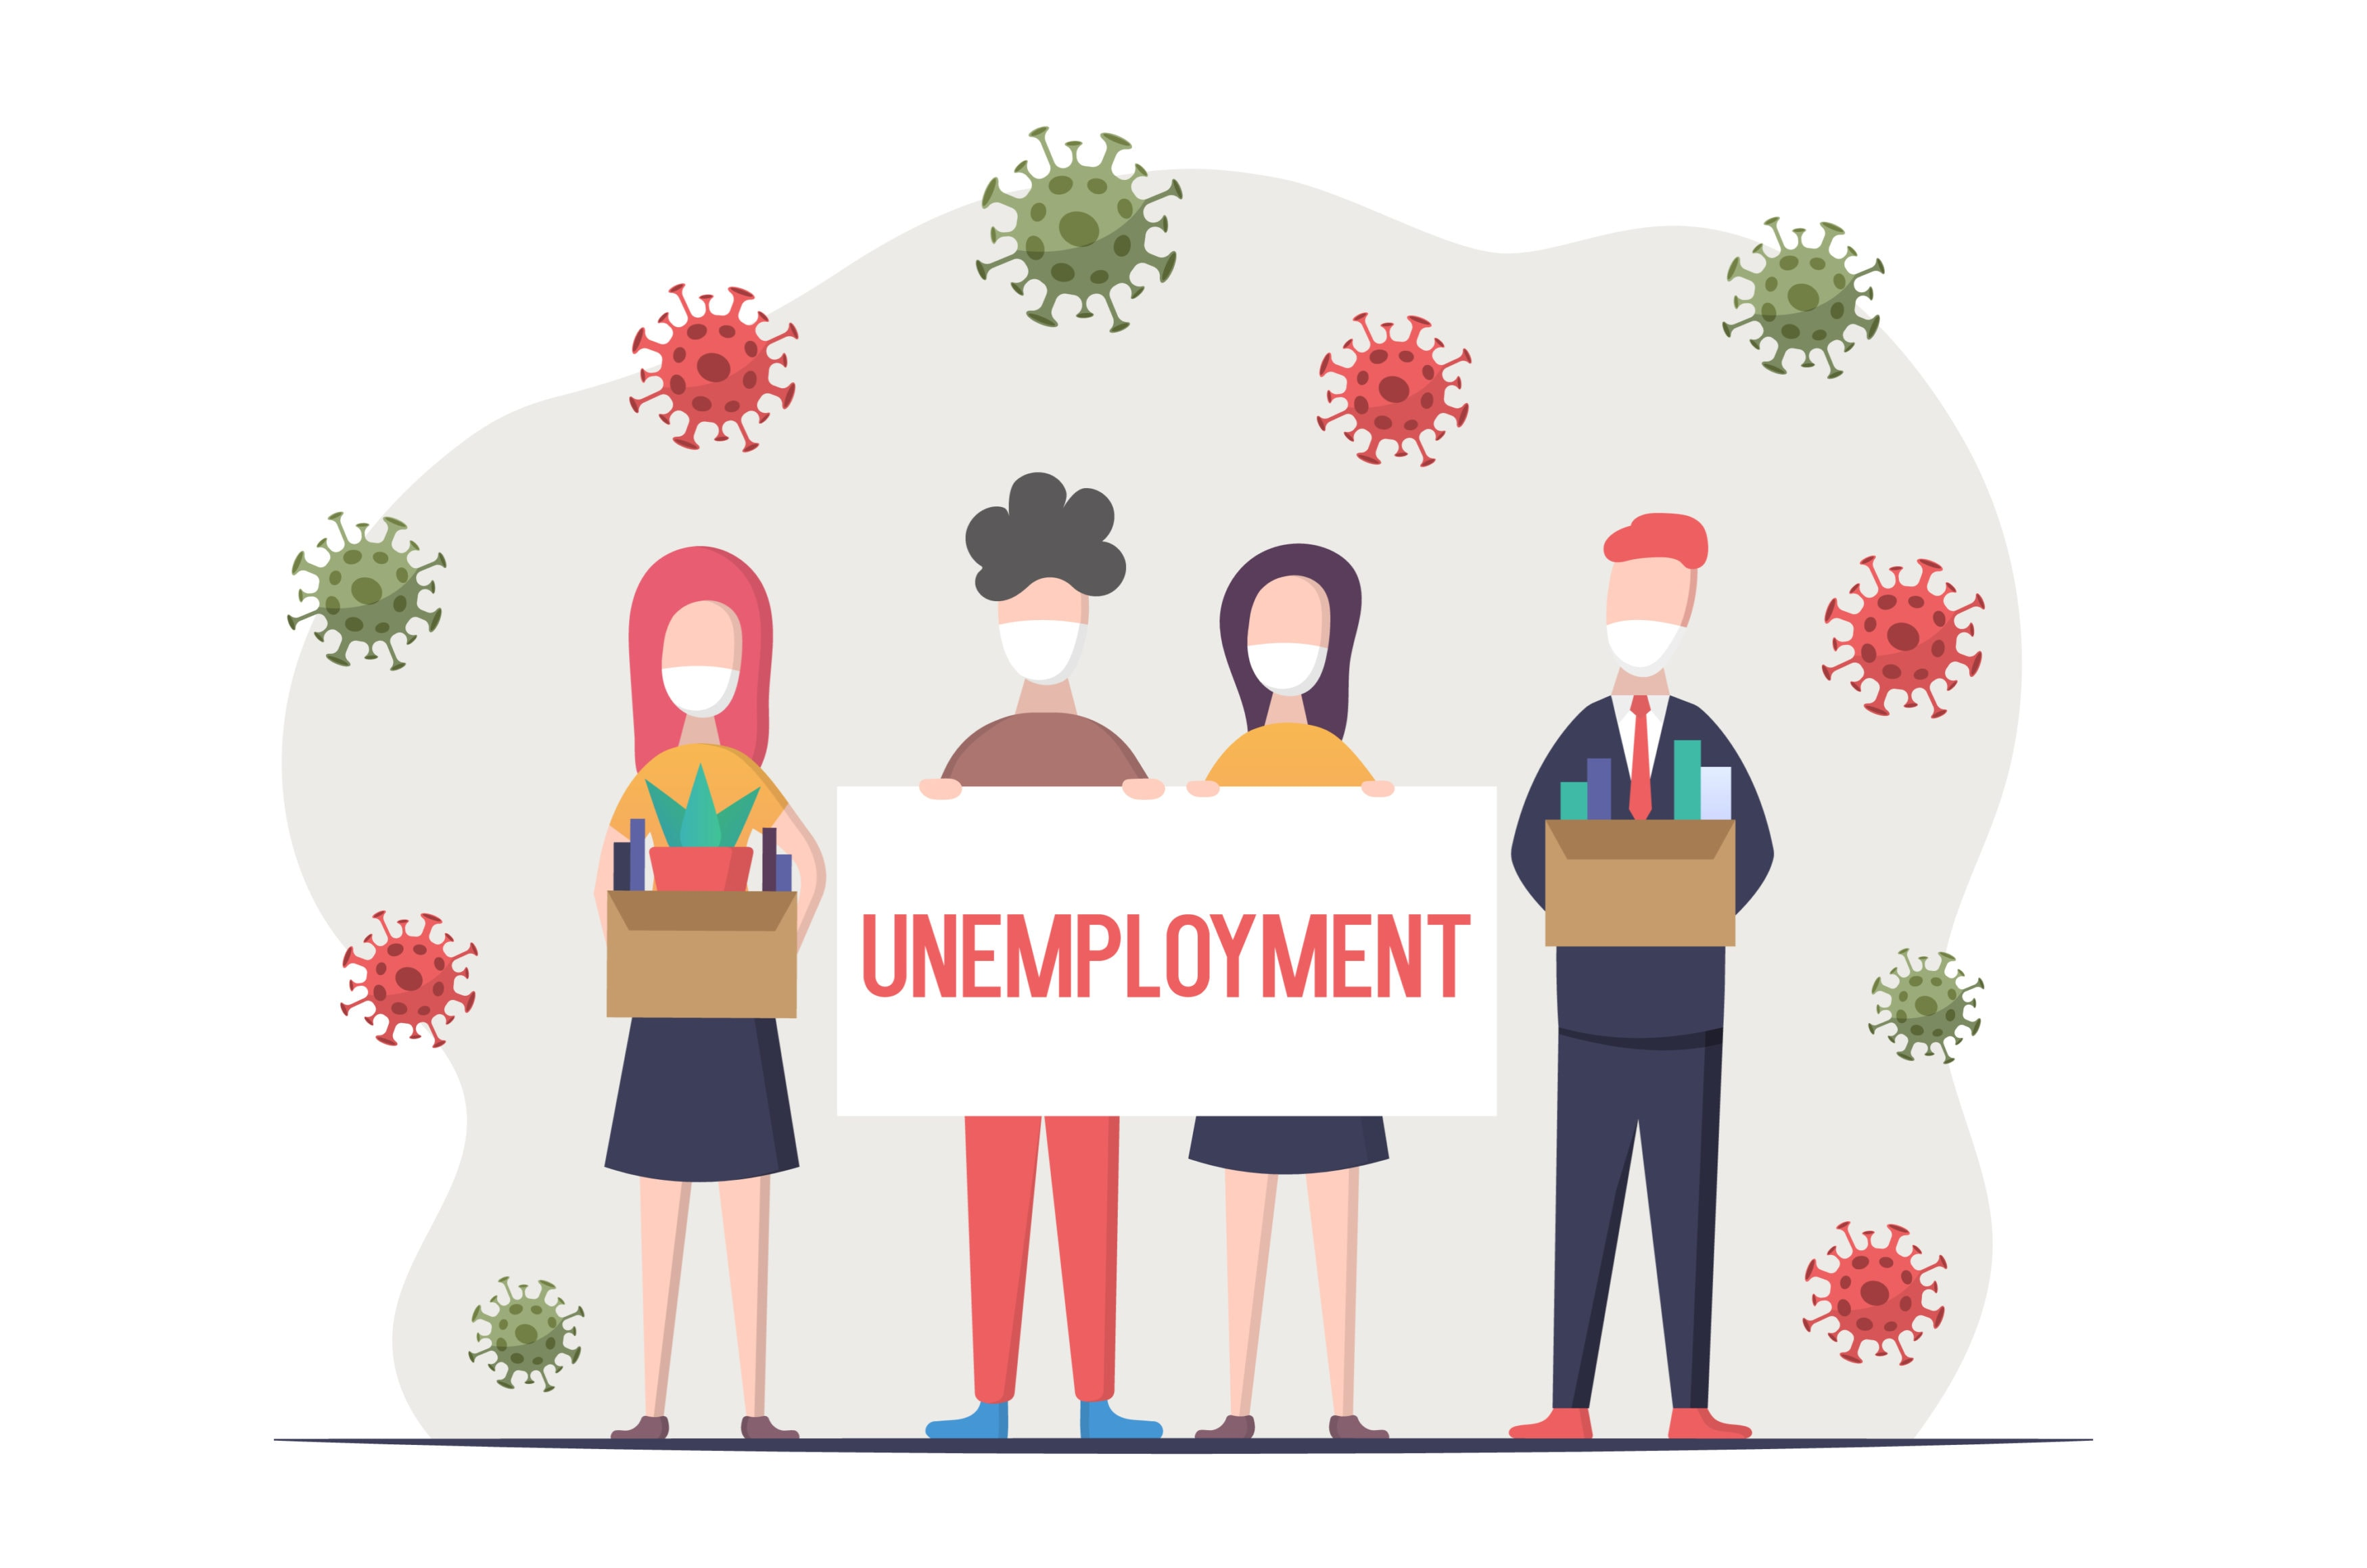 unemployment-coronavirus-3500x2319.jpg